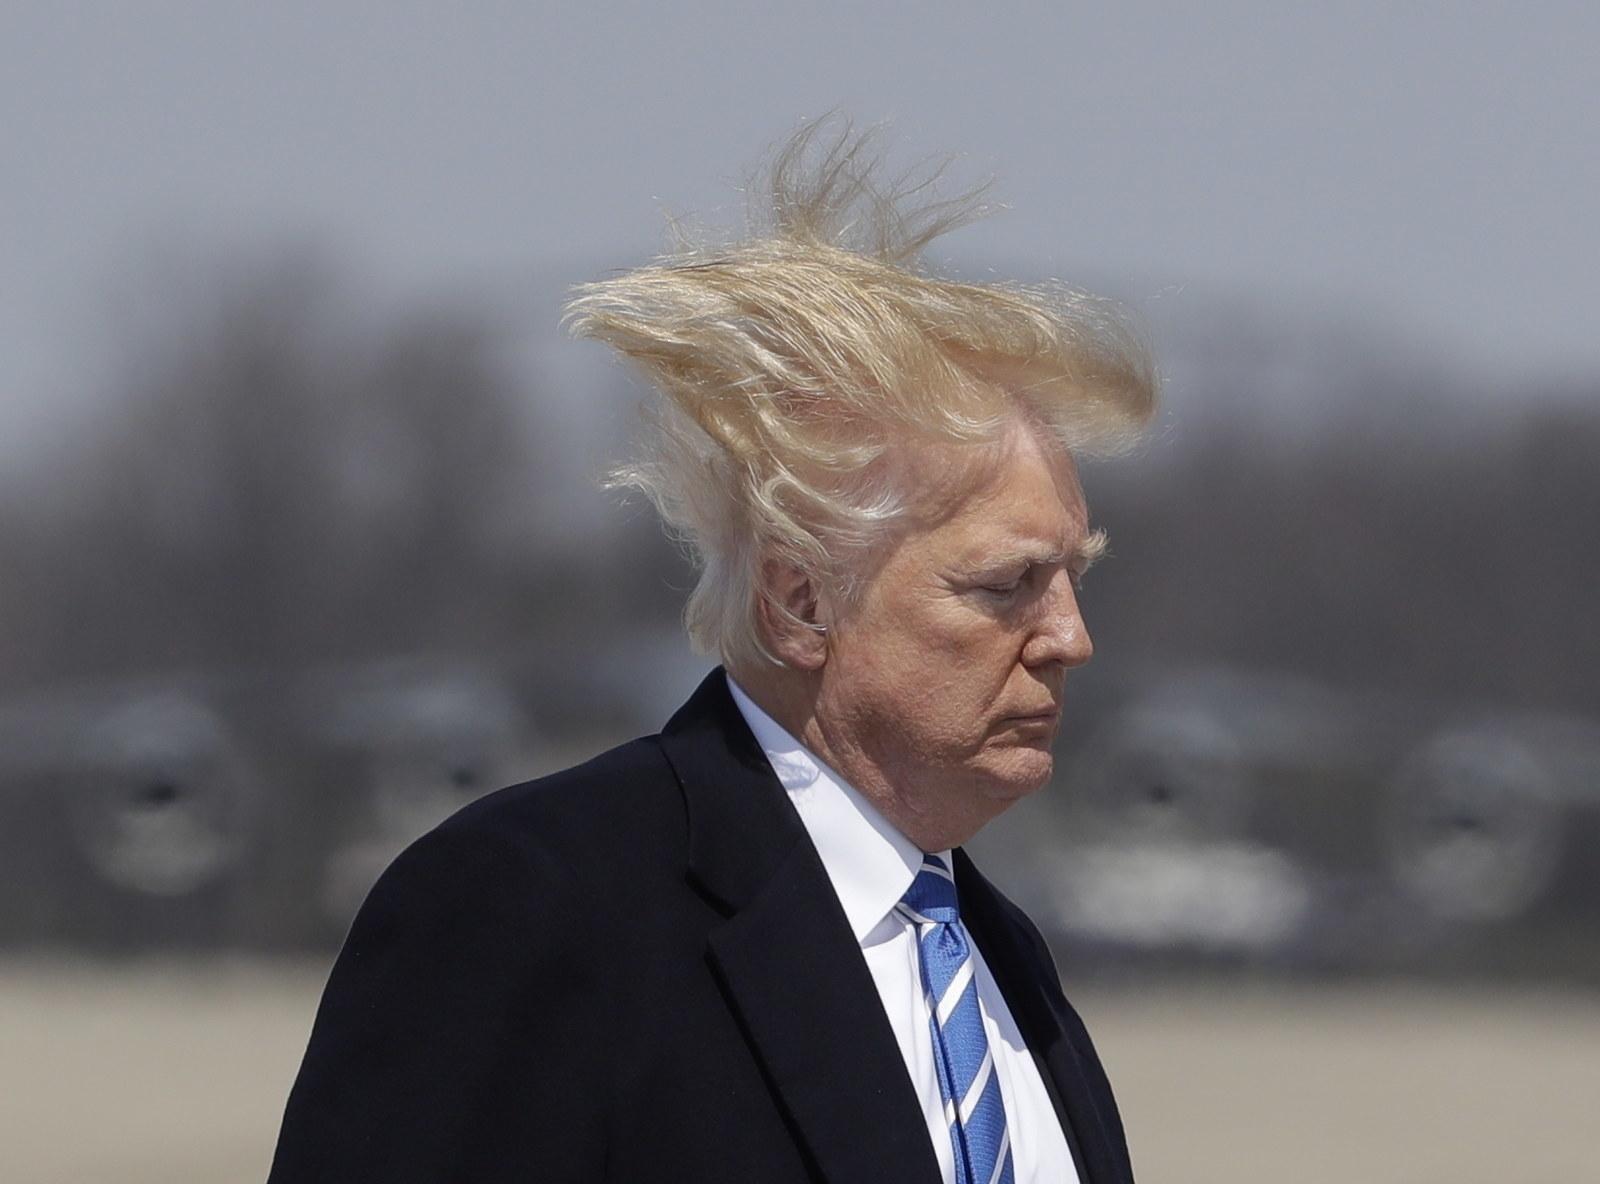 Trump Ohne Toupet